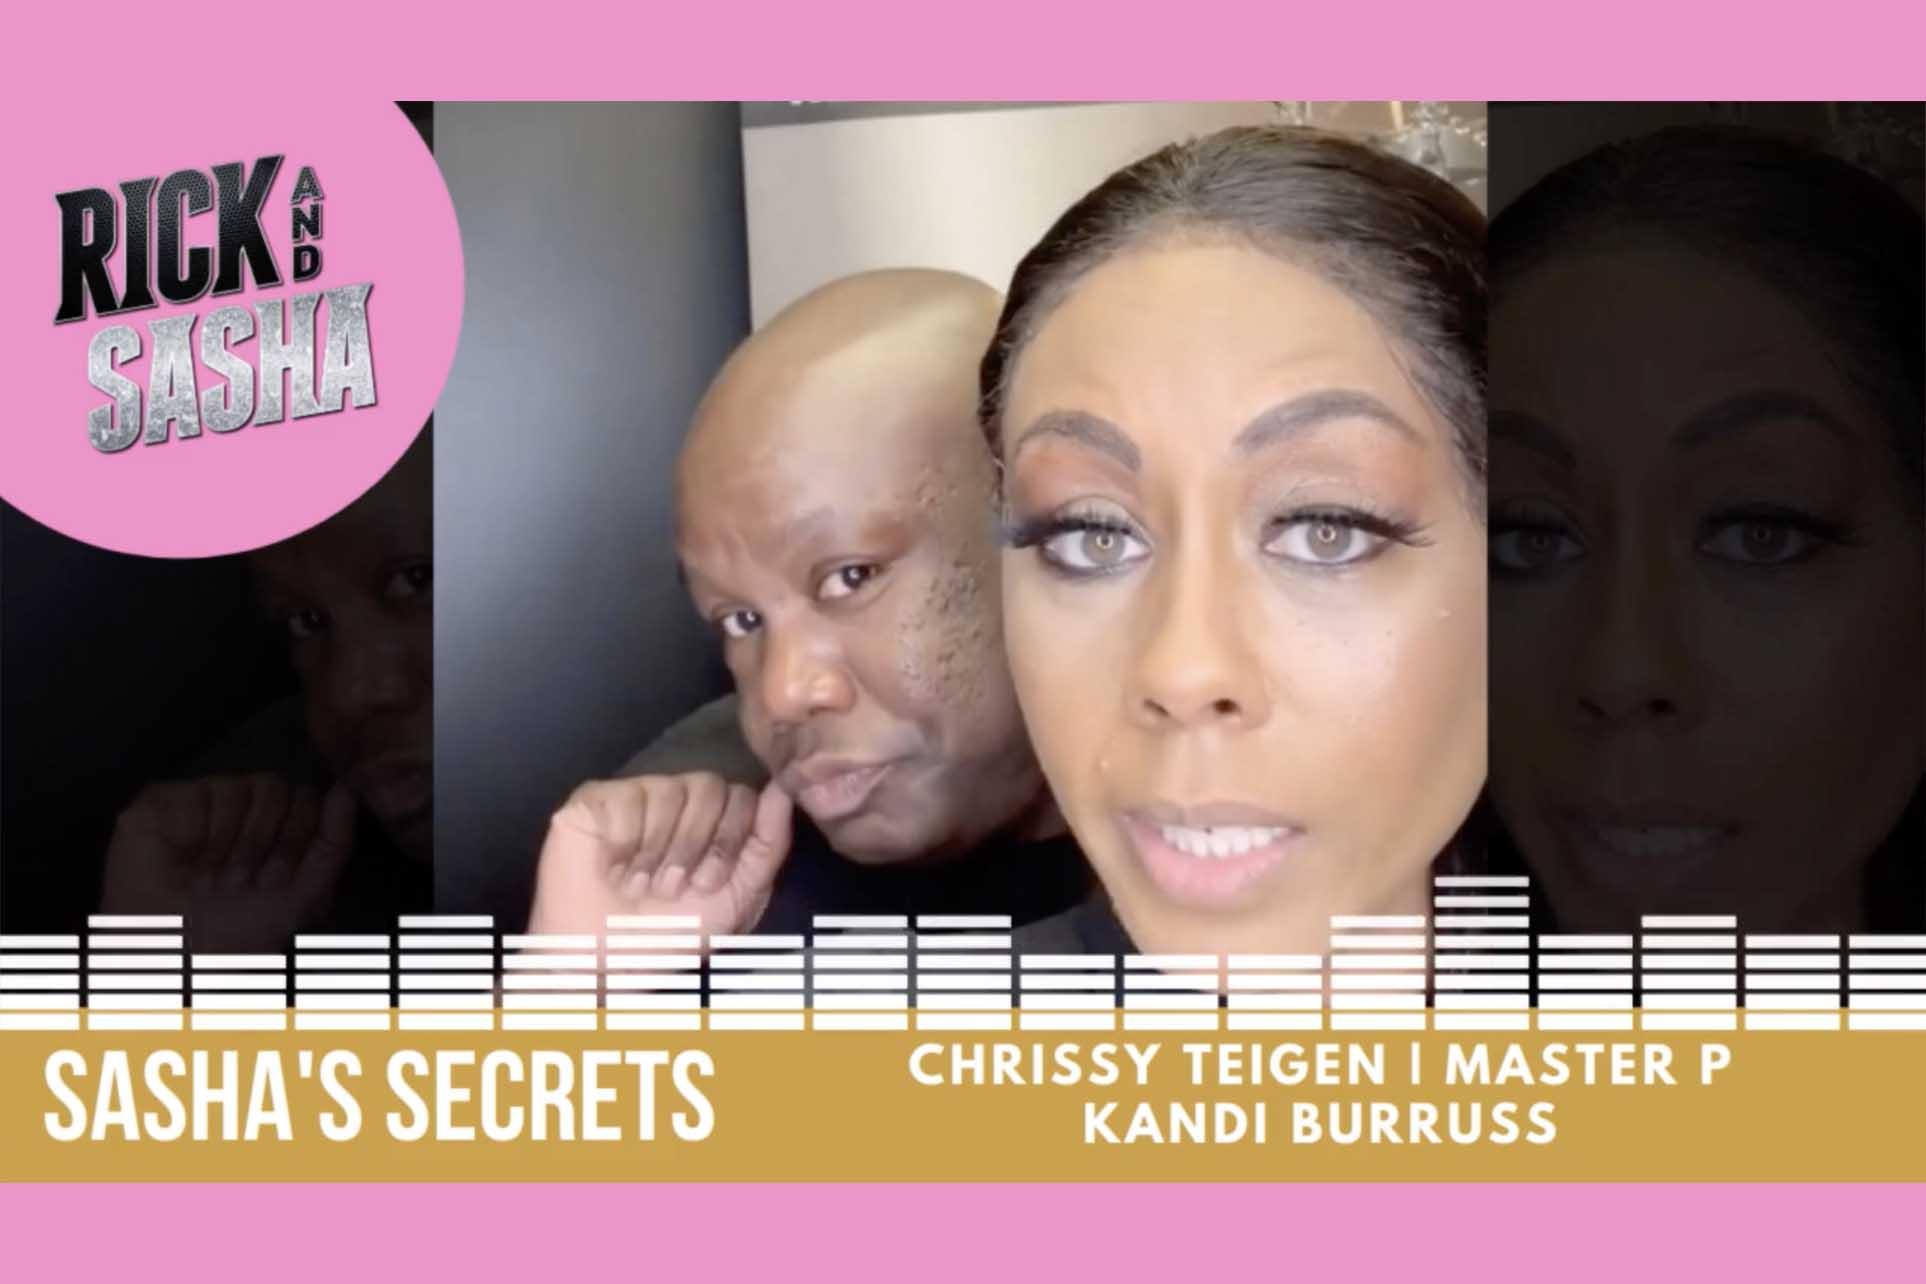 Sasha's Secrets with Chrissy Teigen, Master P & More